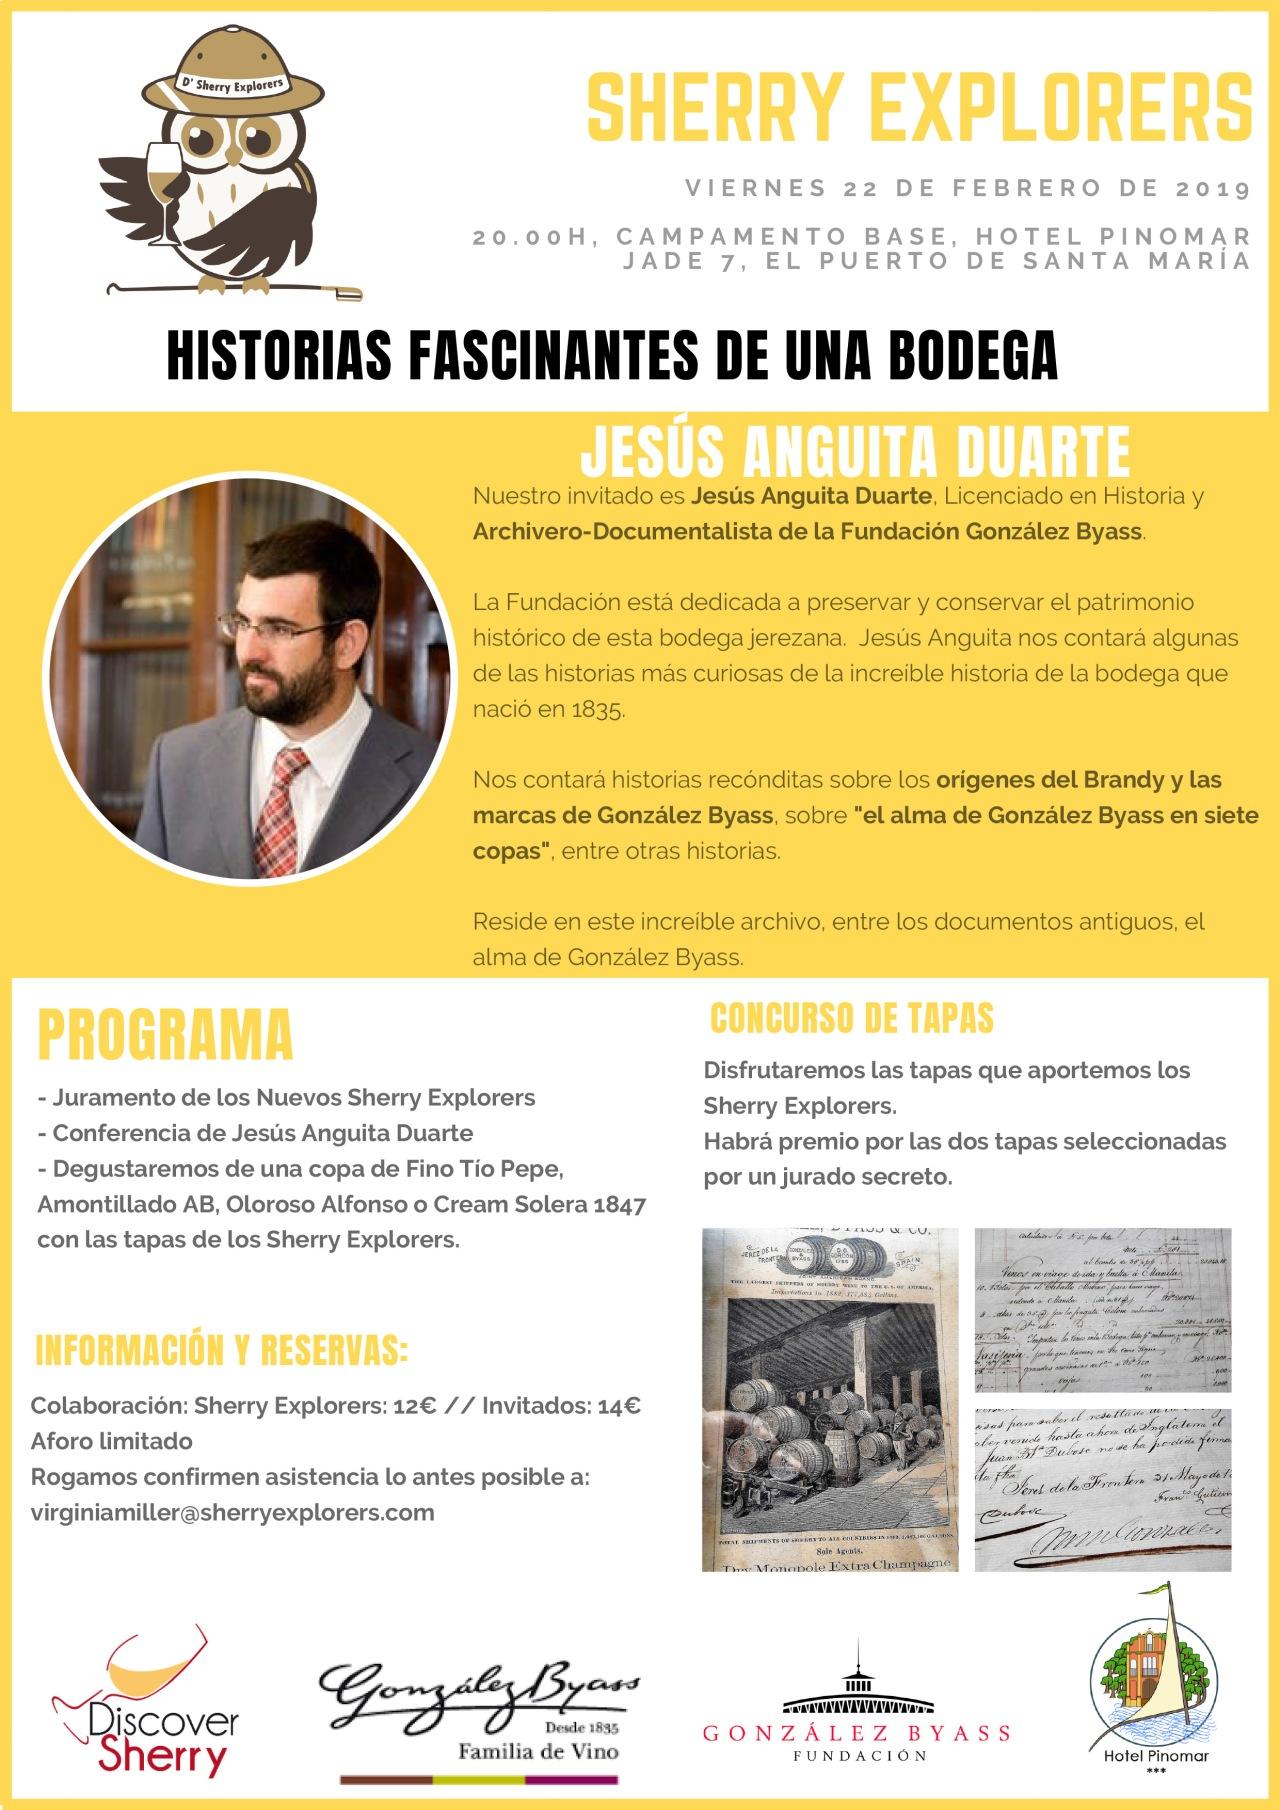 Historias fascinantes de una bodega: Fundación González Byass(Spanish)